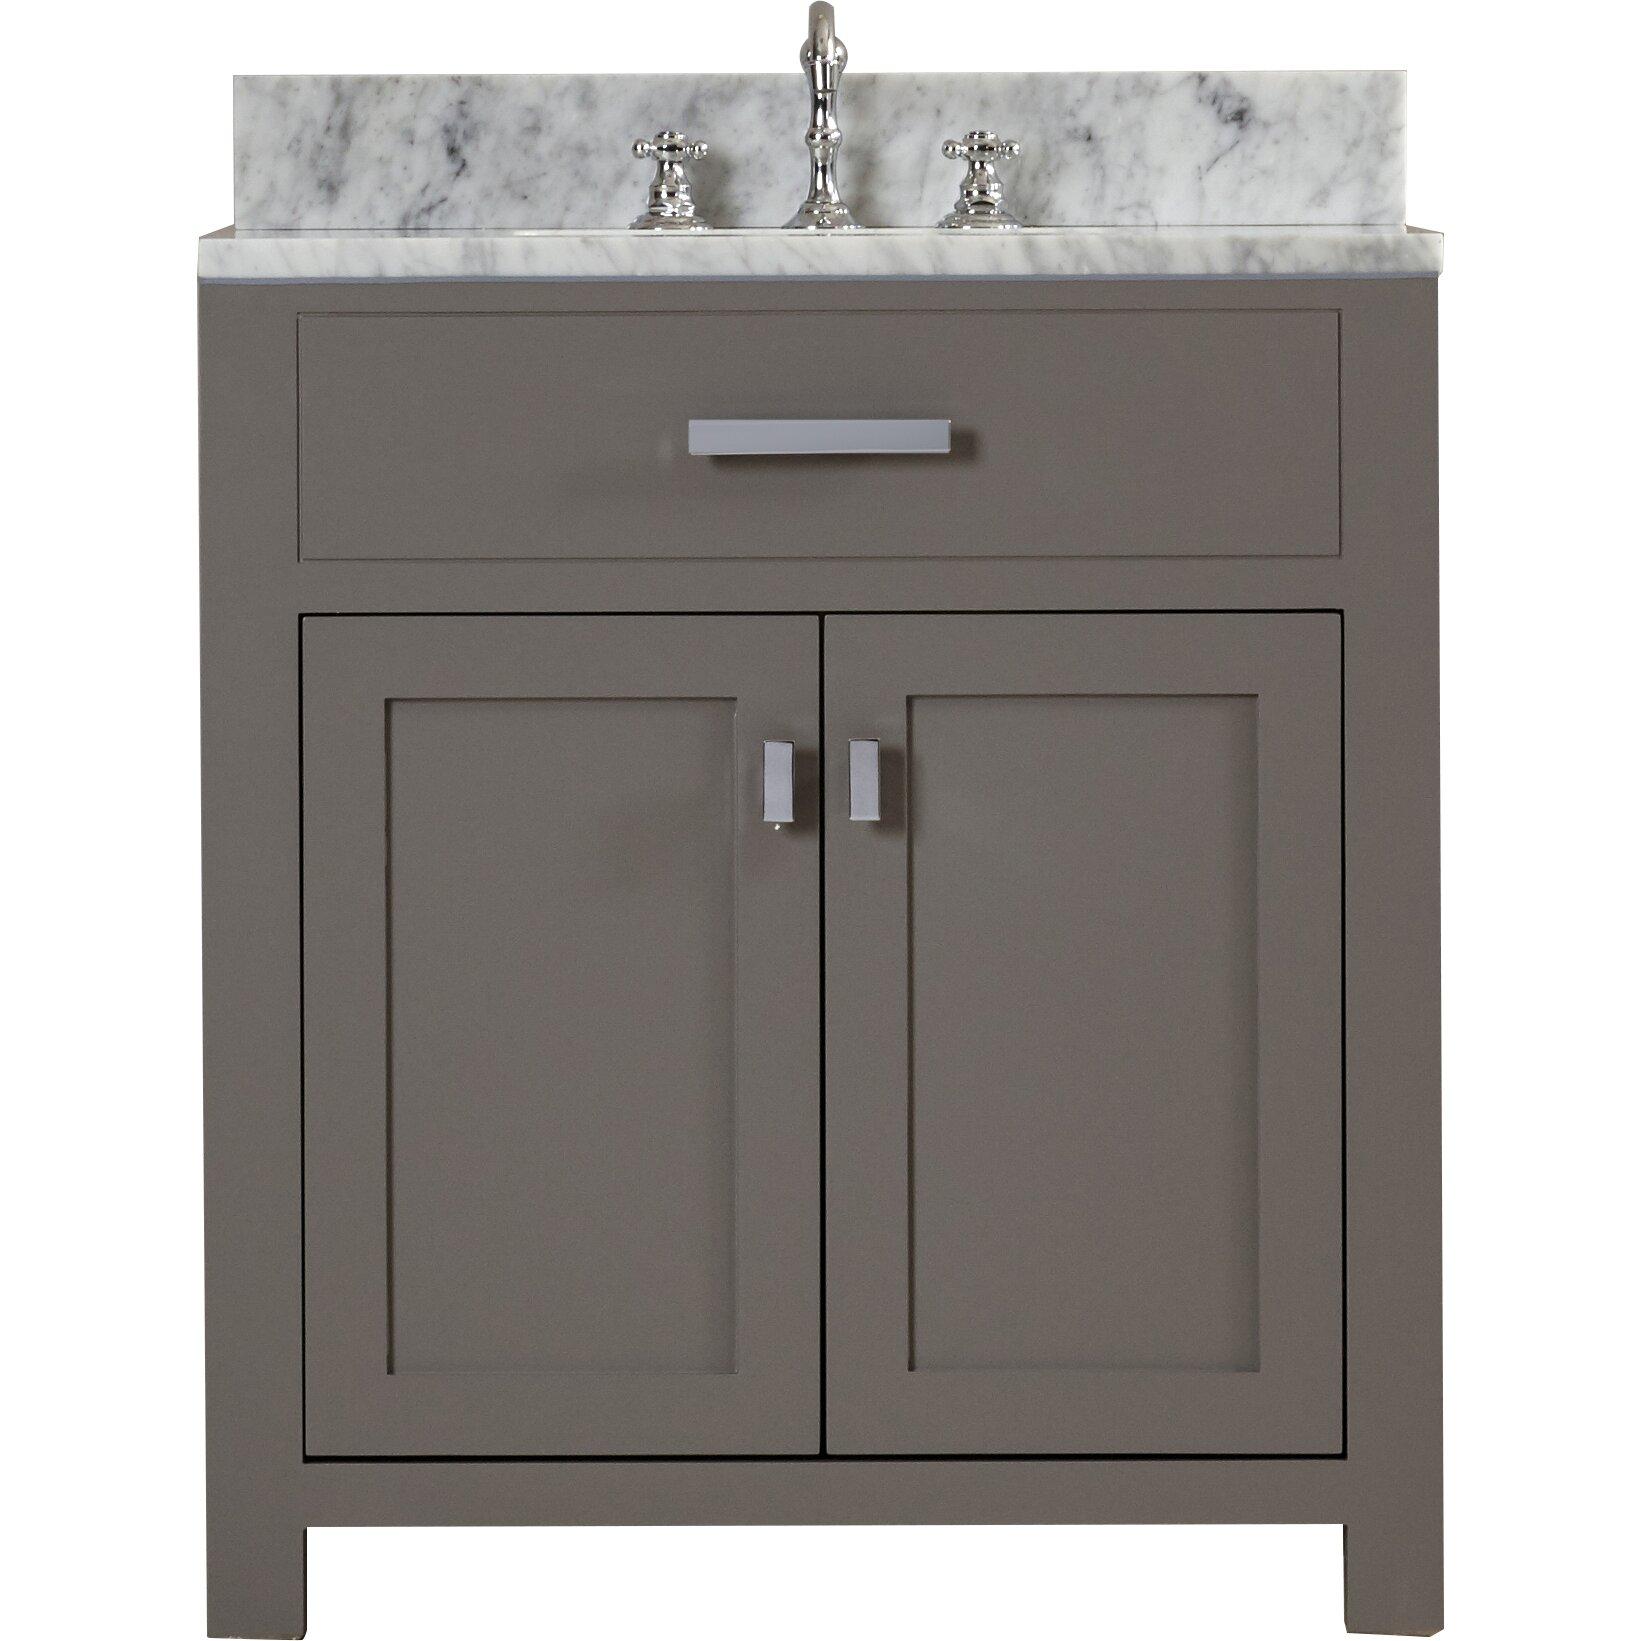 Design Bathroom Cabinets Dcor Design Creighton 30 Single Sink Bathroom Vanity Set